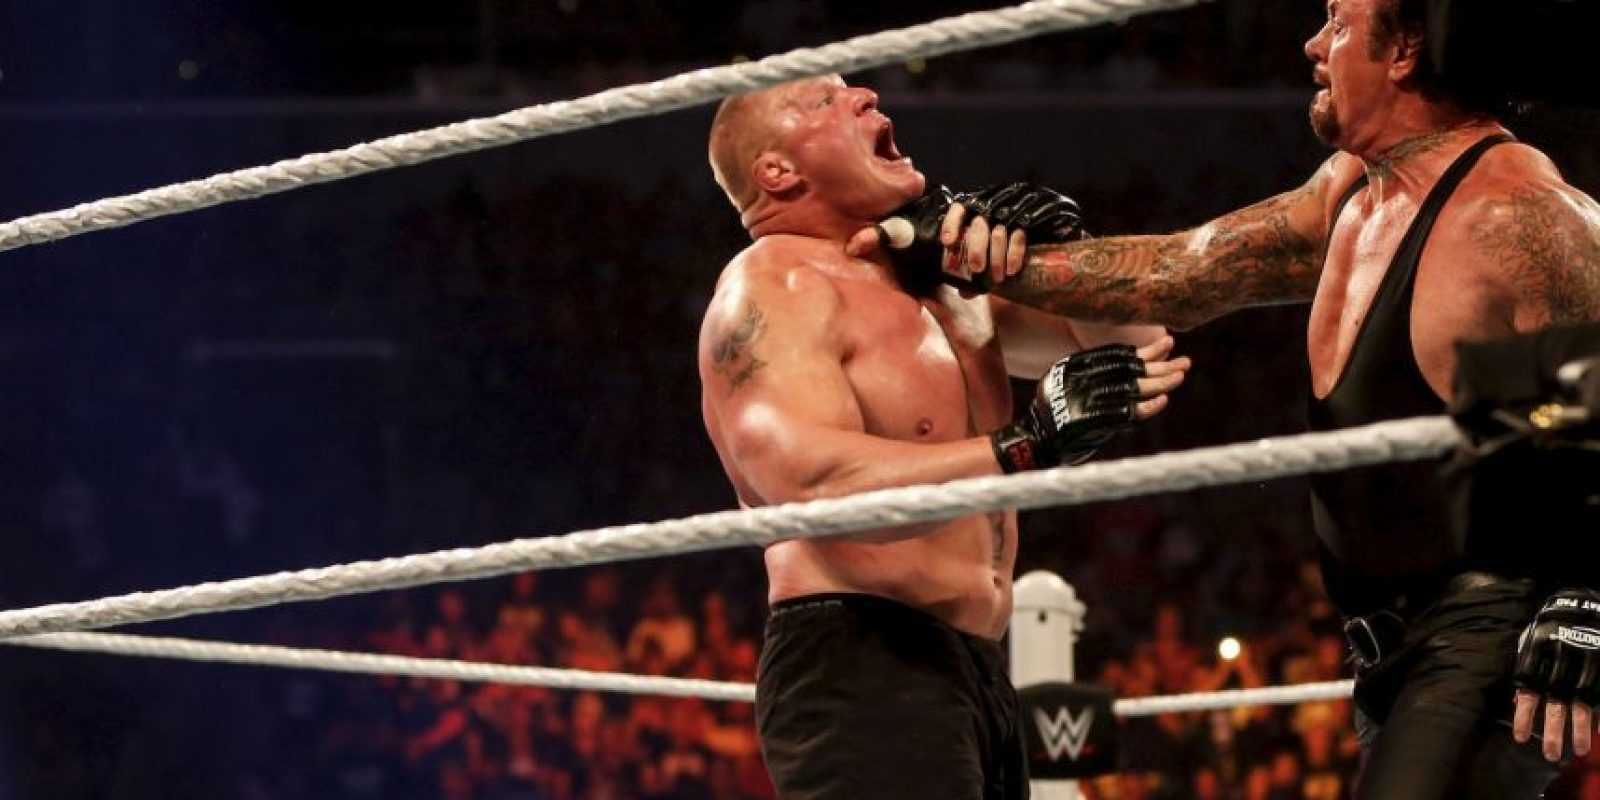 Getty Images Foto:Se espera que Undertaker regrese en Wrestlemania 33